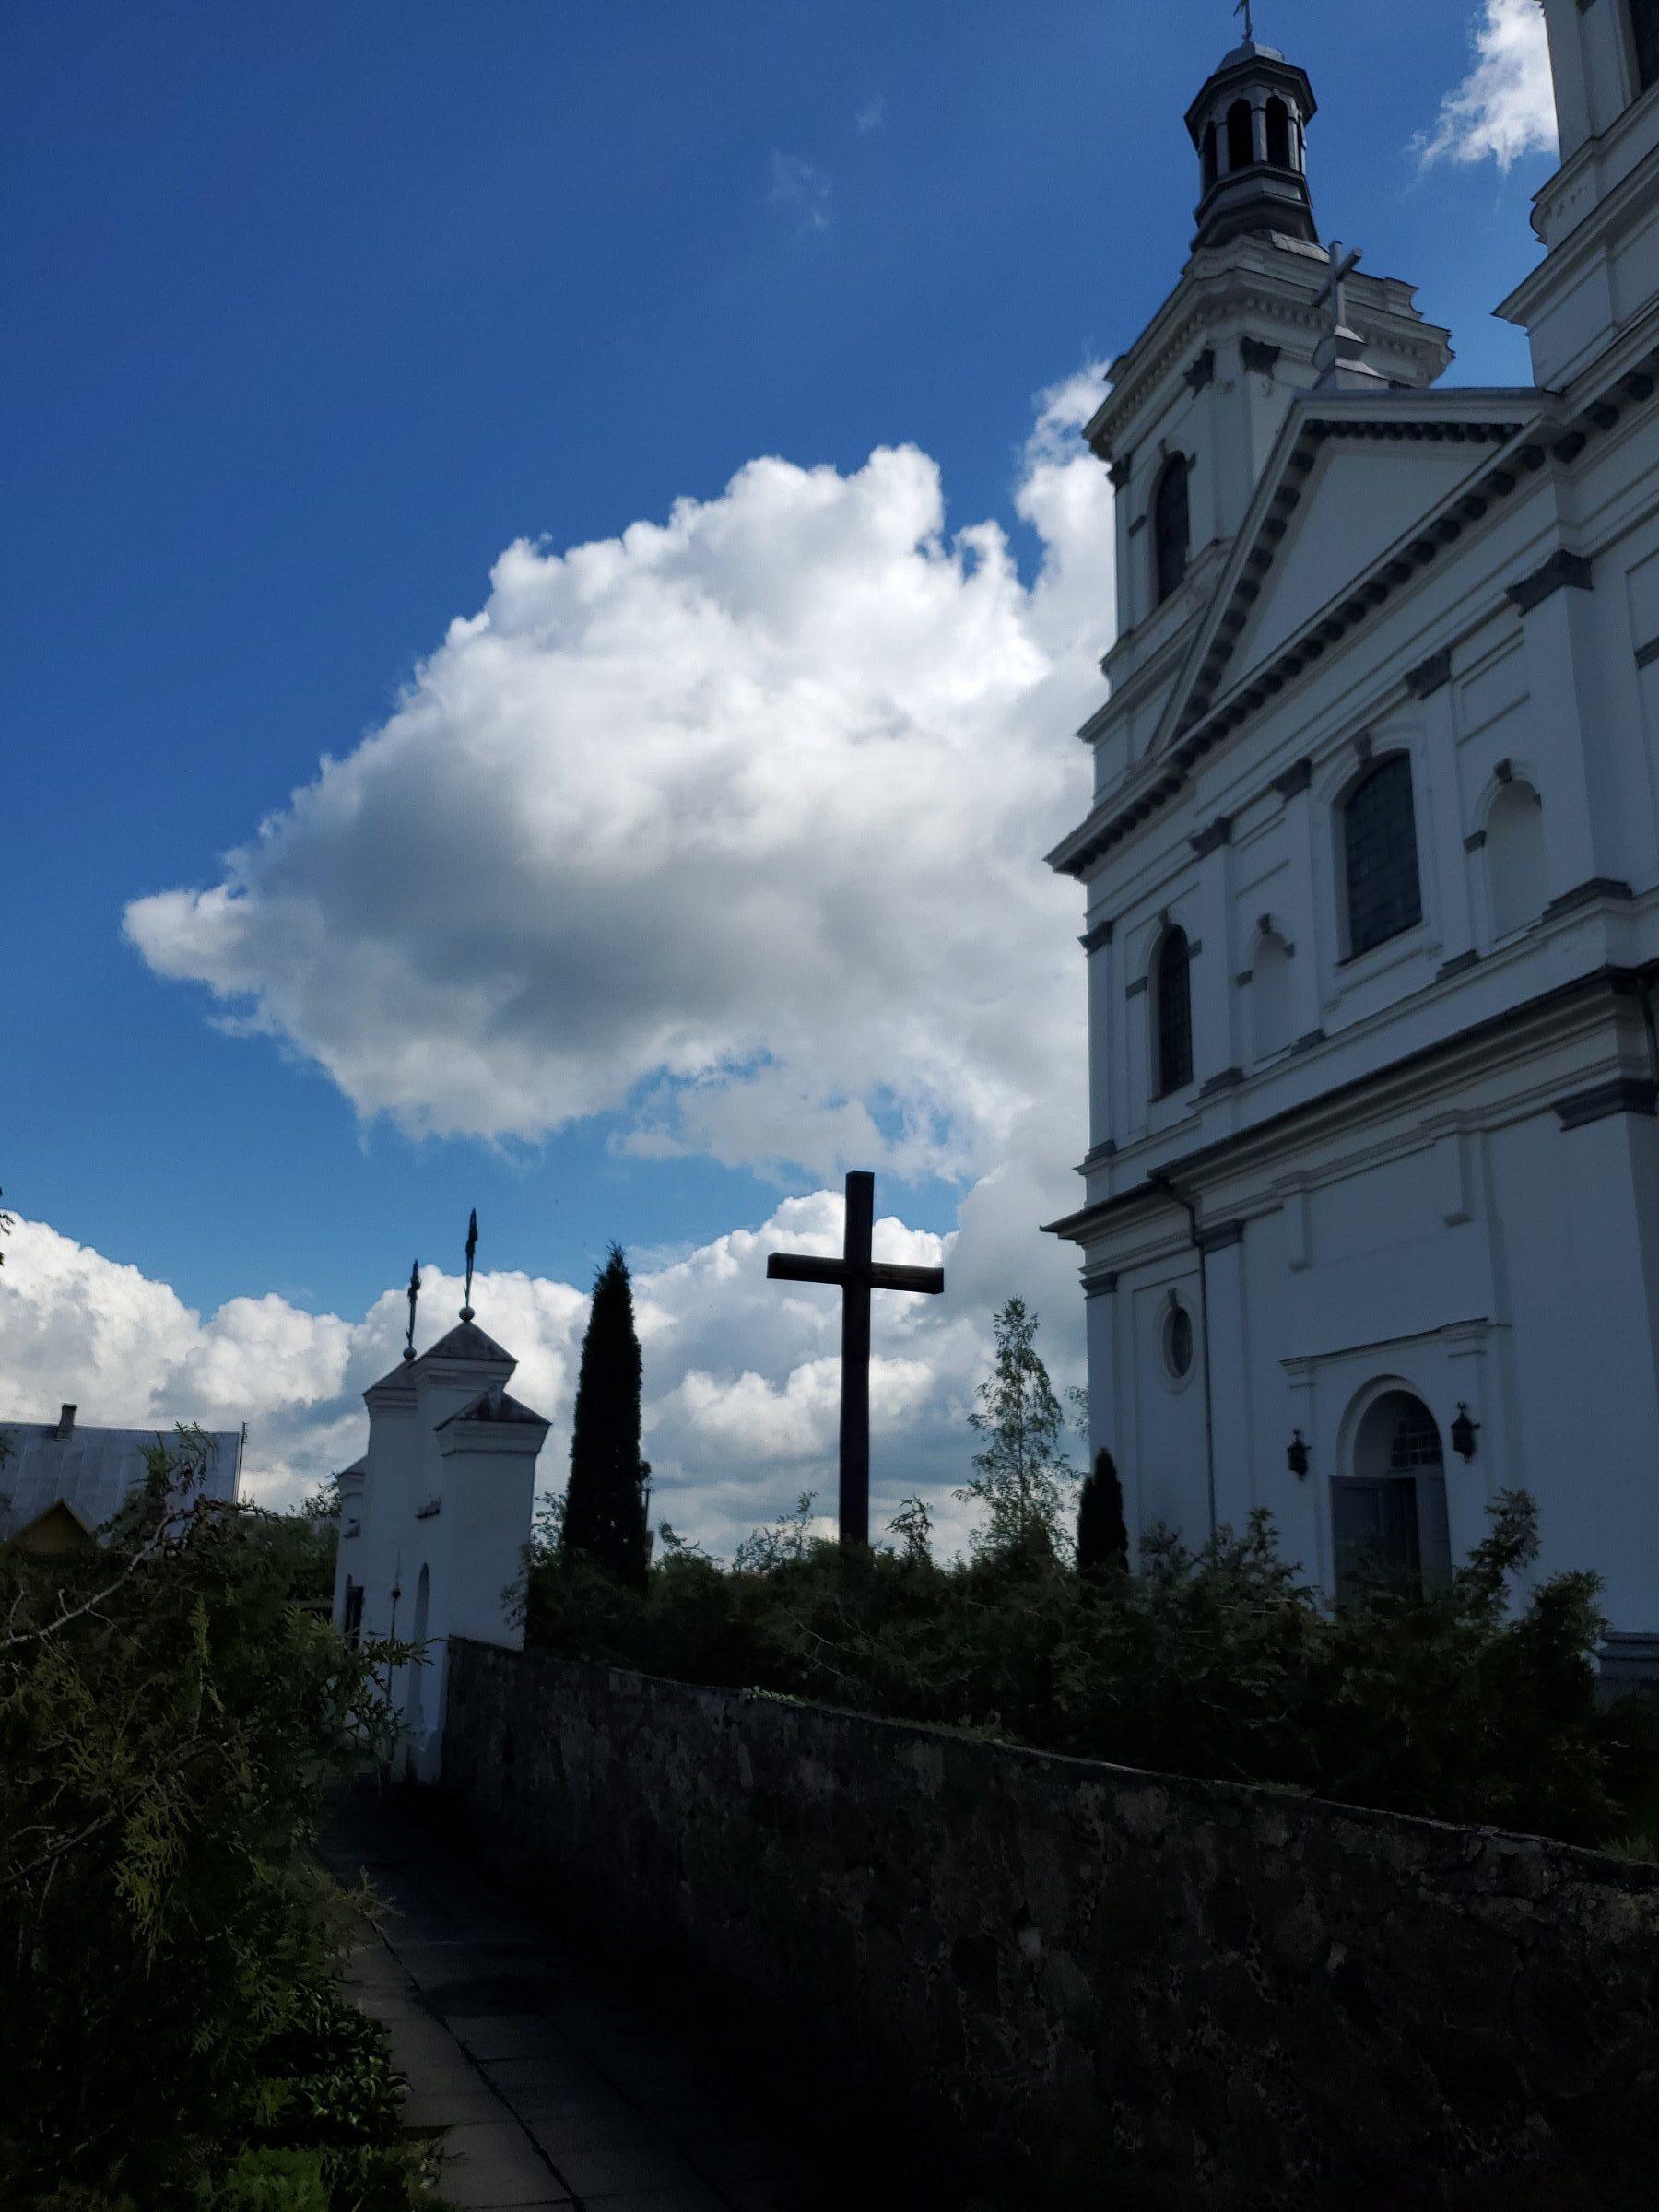 20200606 110820 rotated e1605867668529 - Костел Святого Андрея Баболи в Лынтупах